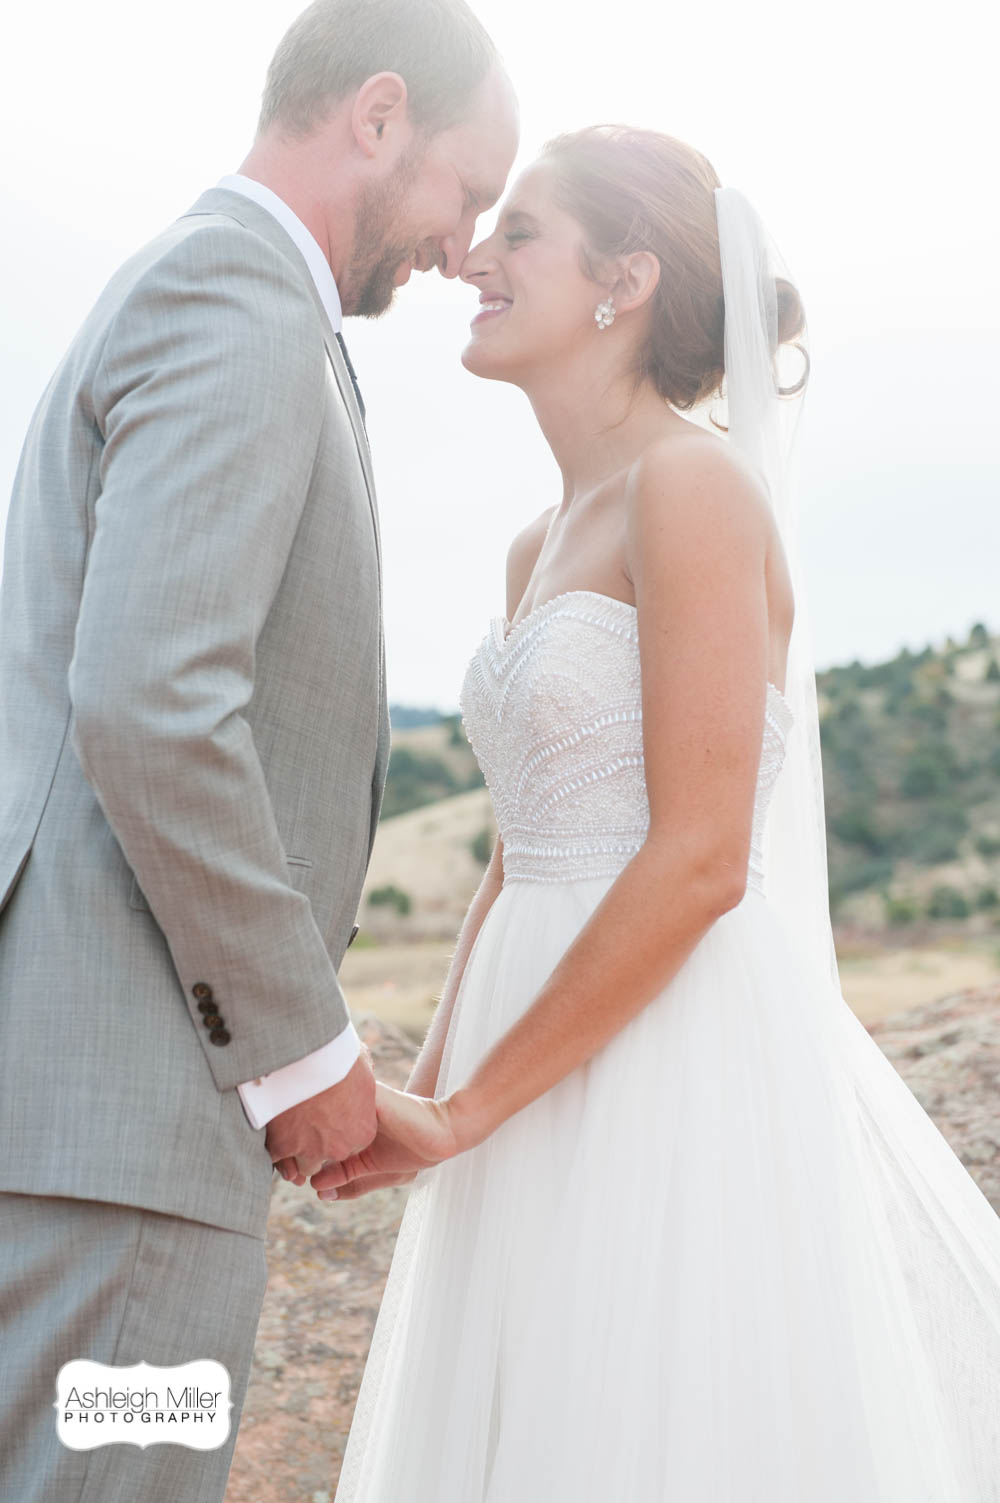 AMW-Wedding-EmilyRyan-WillowRidgeManor-4057-Blog.jpg